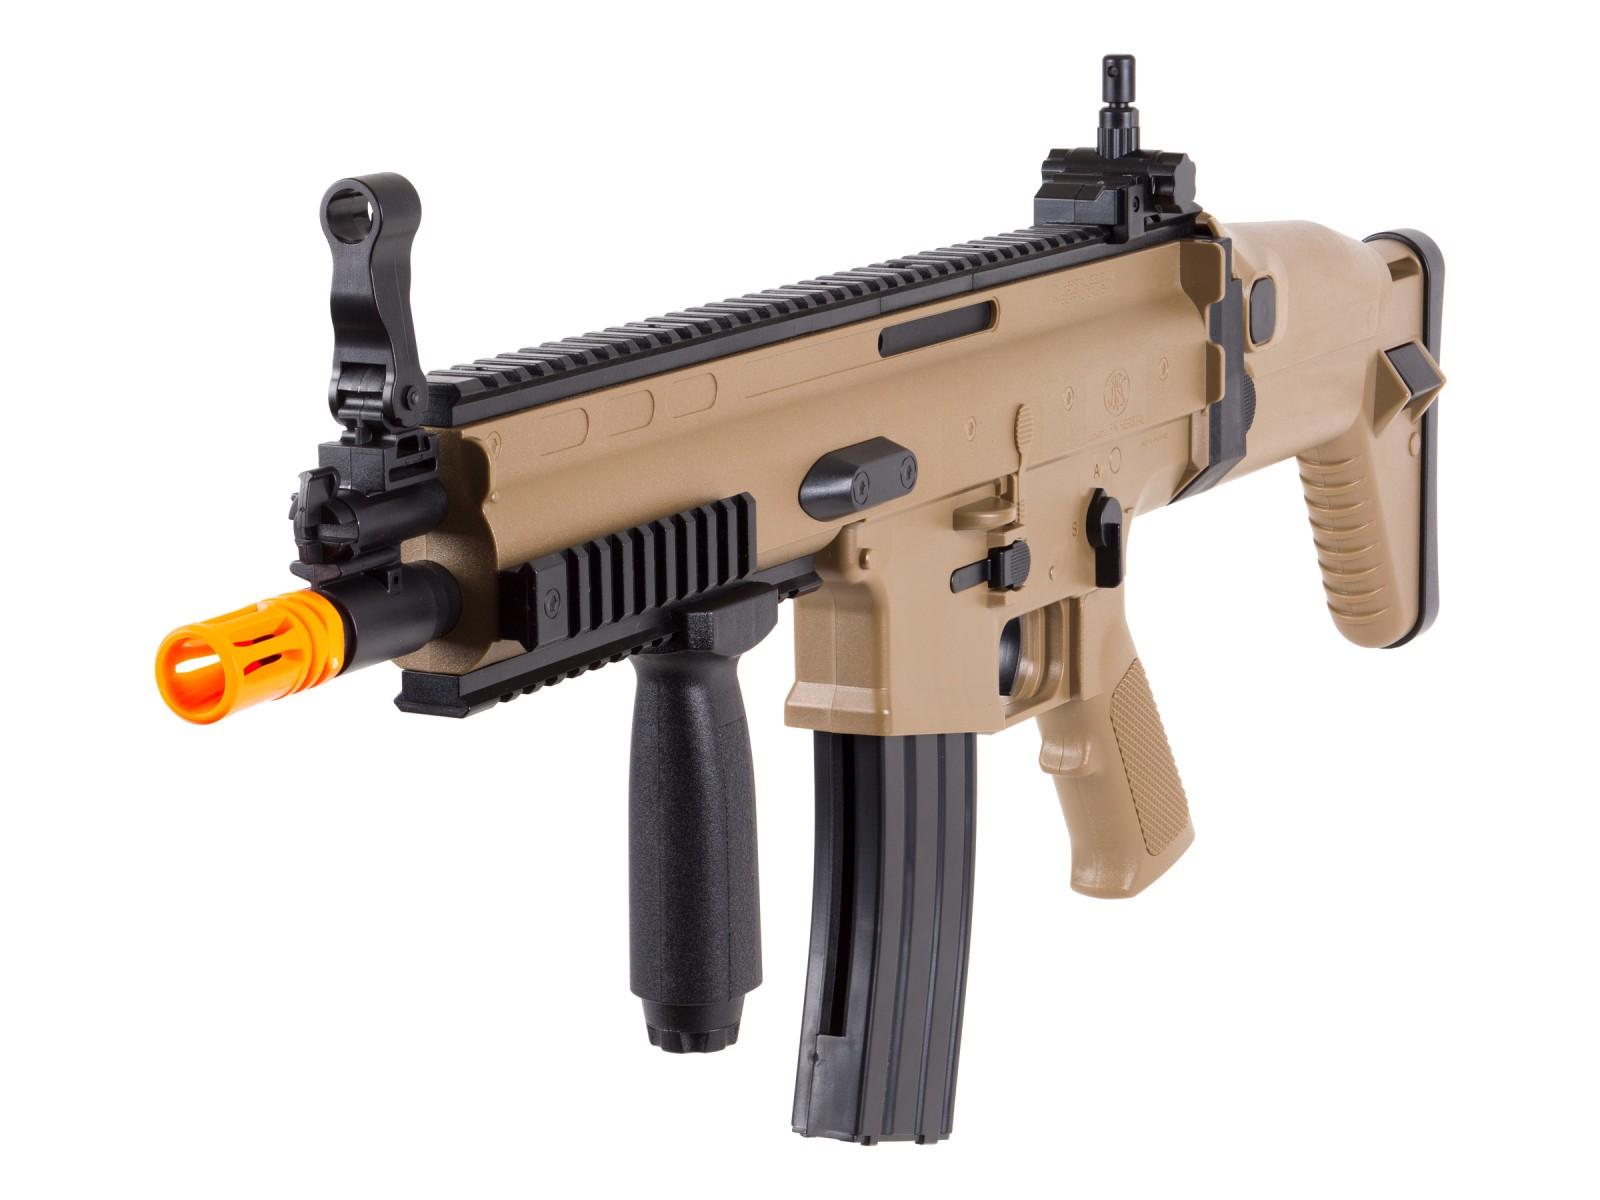 Cheap FN Herstal SCAR-L Spring Airsoft Rifle, Tan 6mm